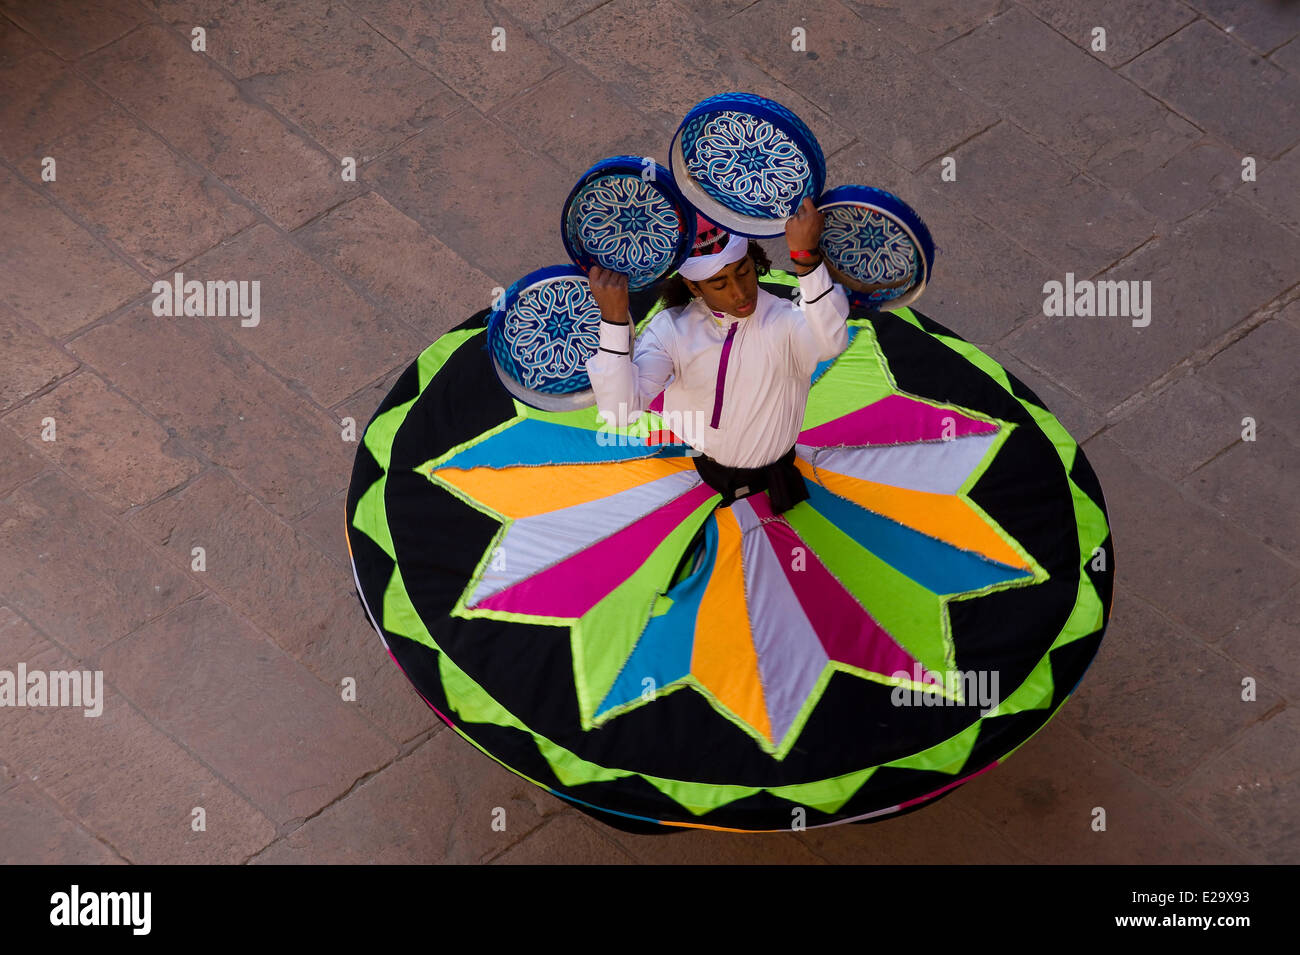 India, Rajasthan state, Jodhpur, Mehrangarh Fort, sufi festival - Stock Image